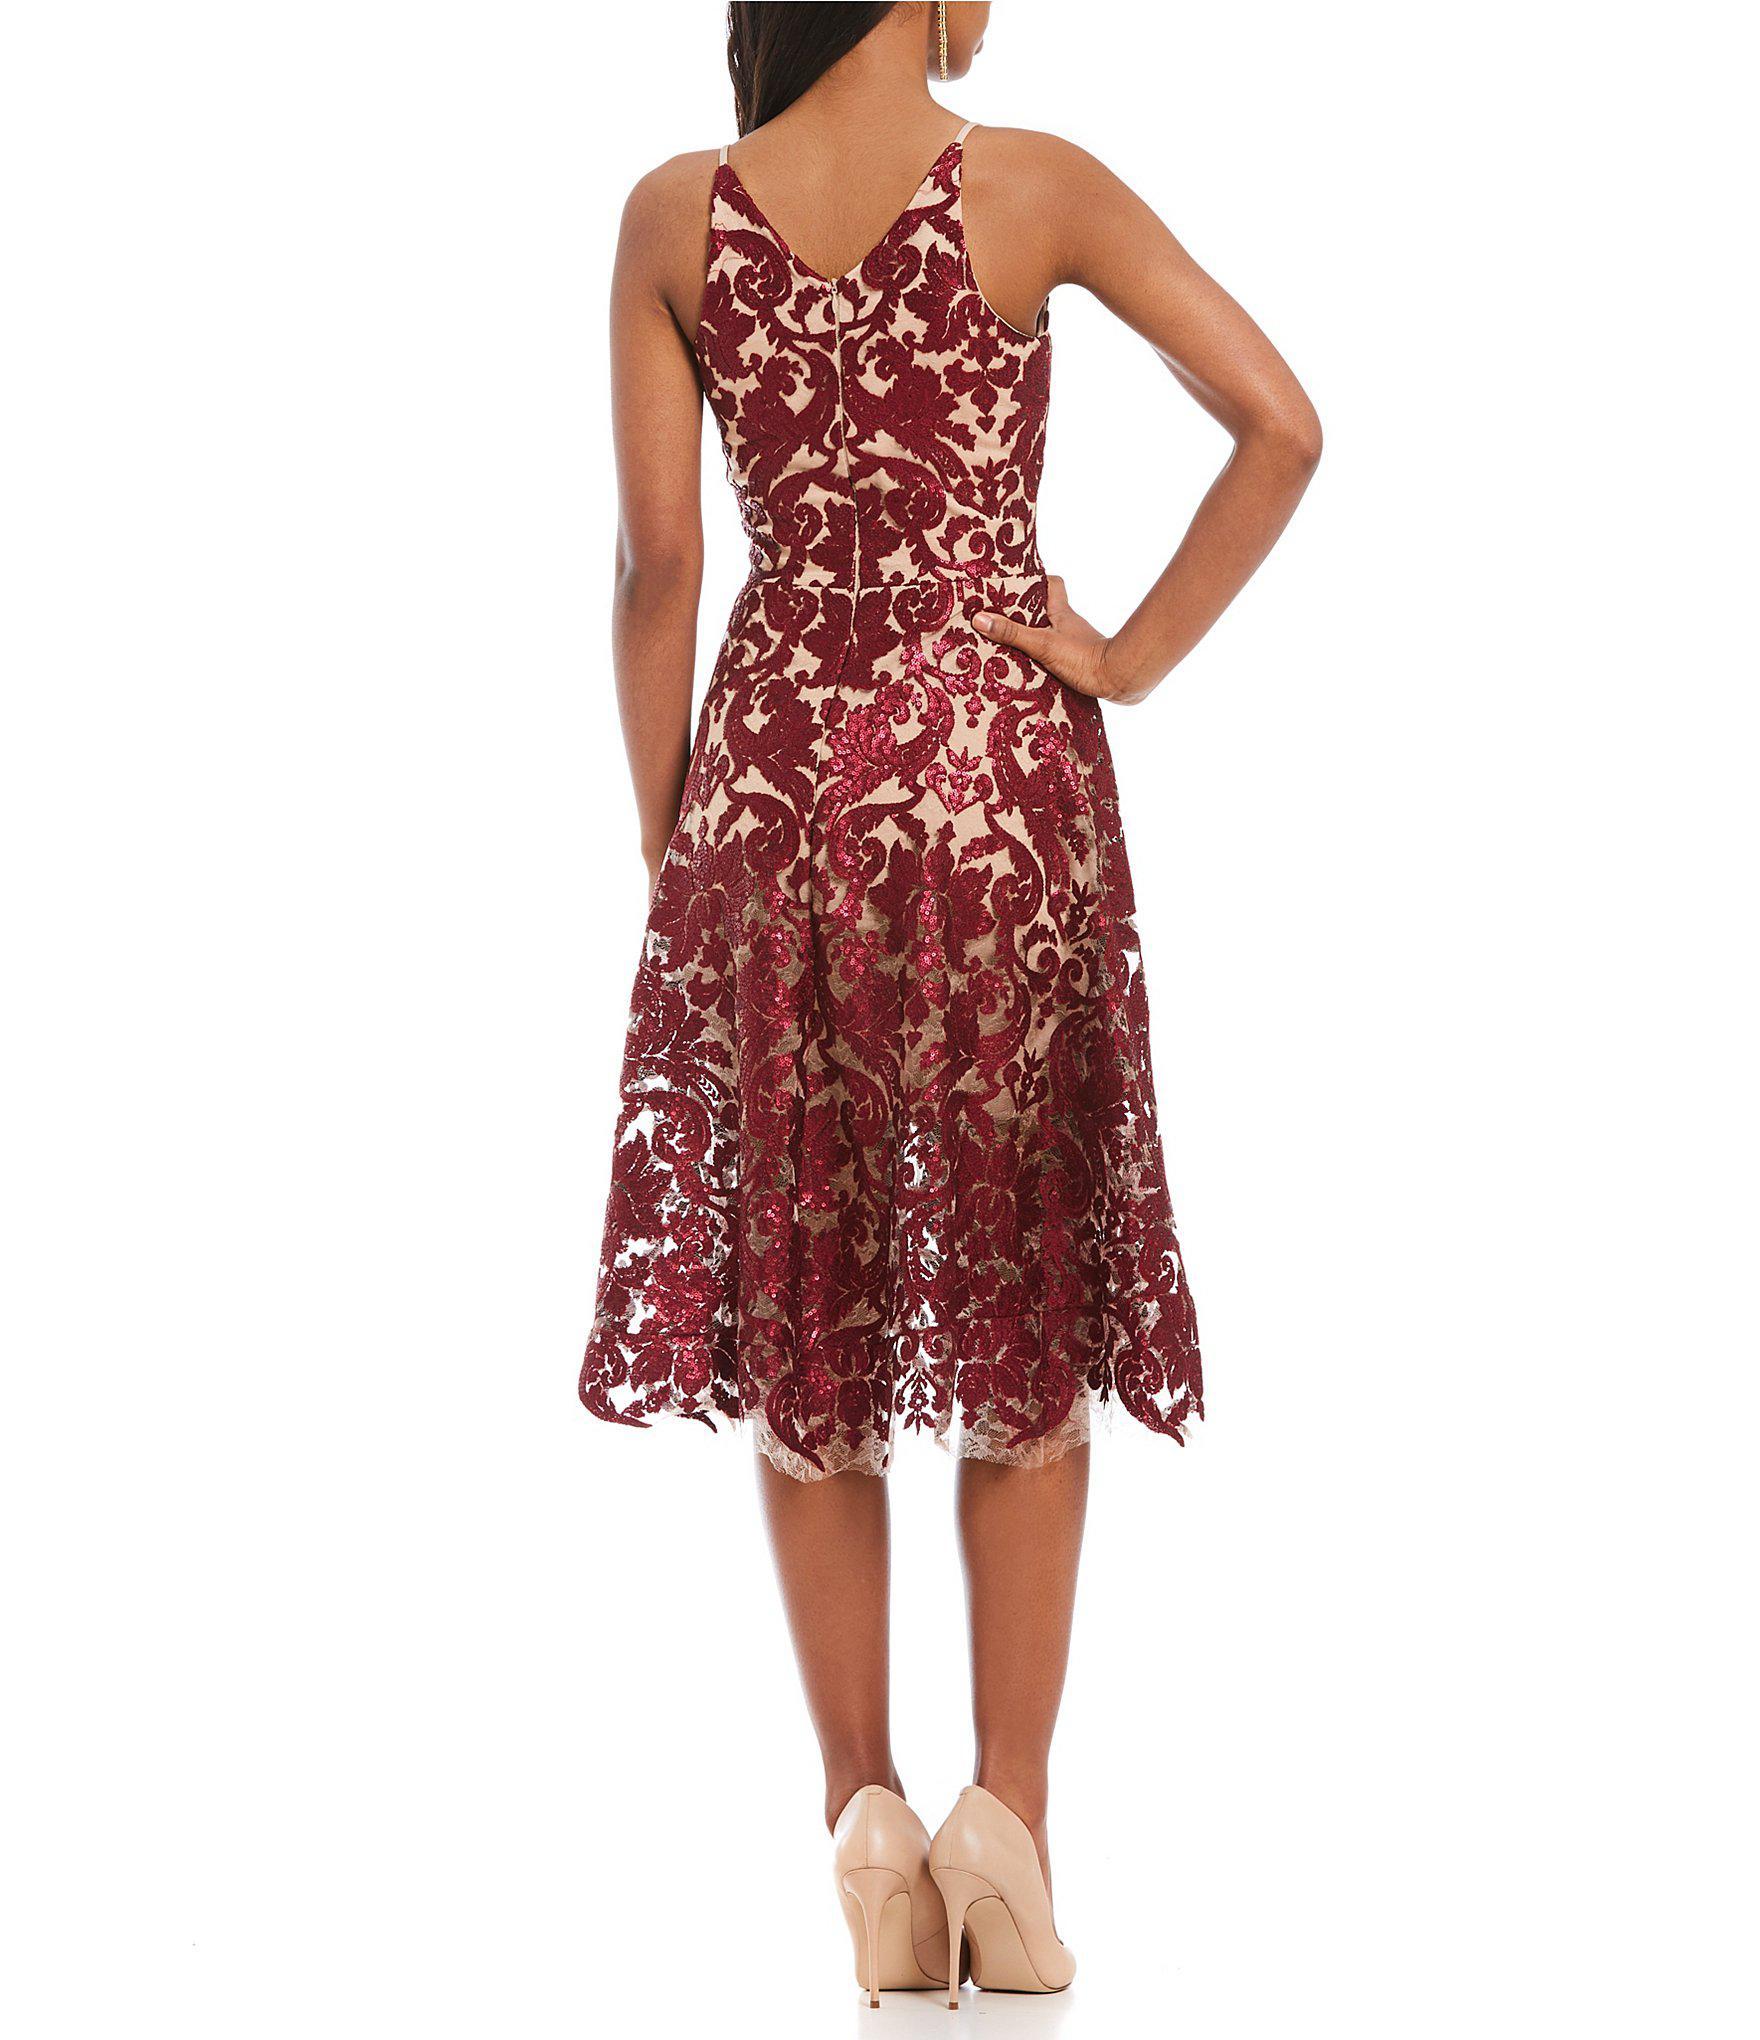 07ebae8b13d Lyst - Dress the Population Blair Deep V-neck Sequin Lace Midi Dress ...